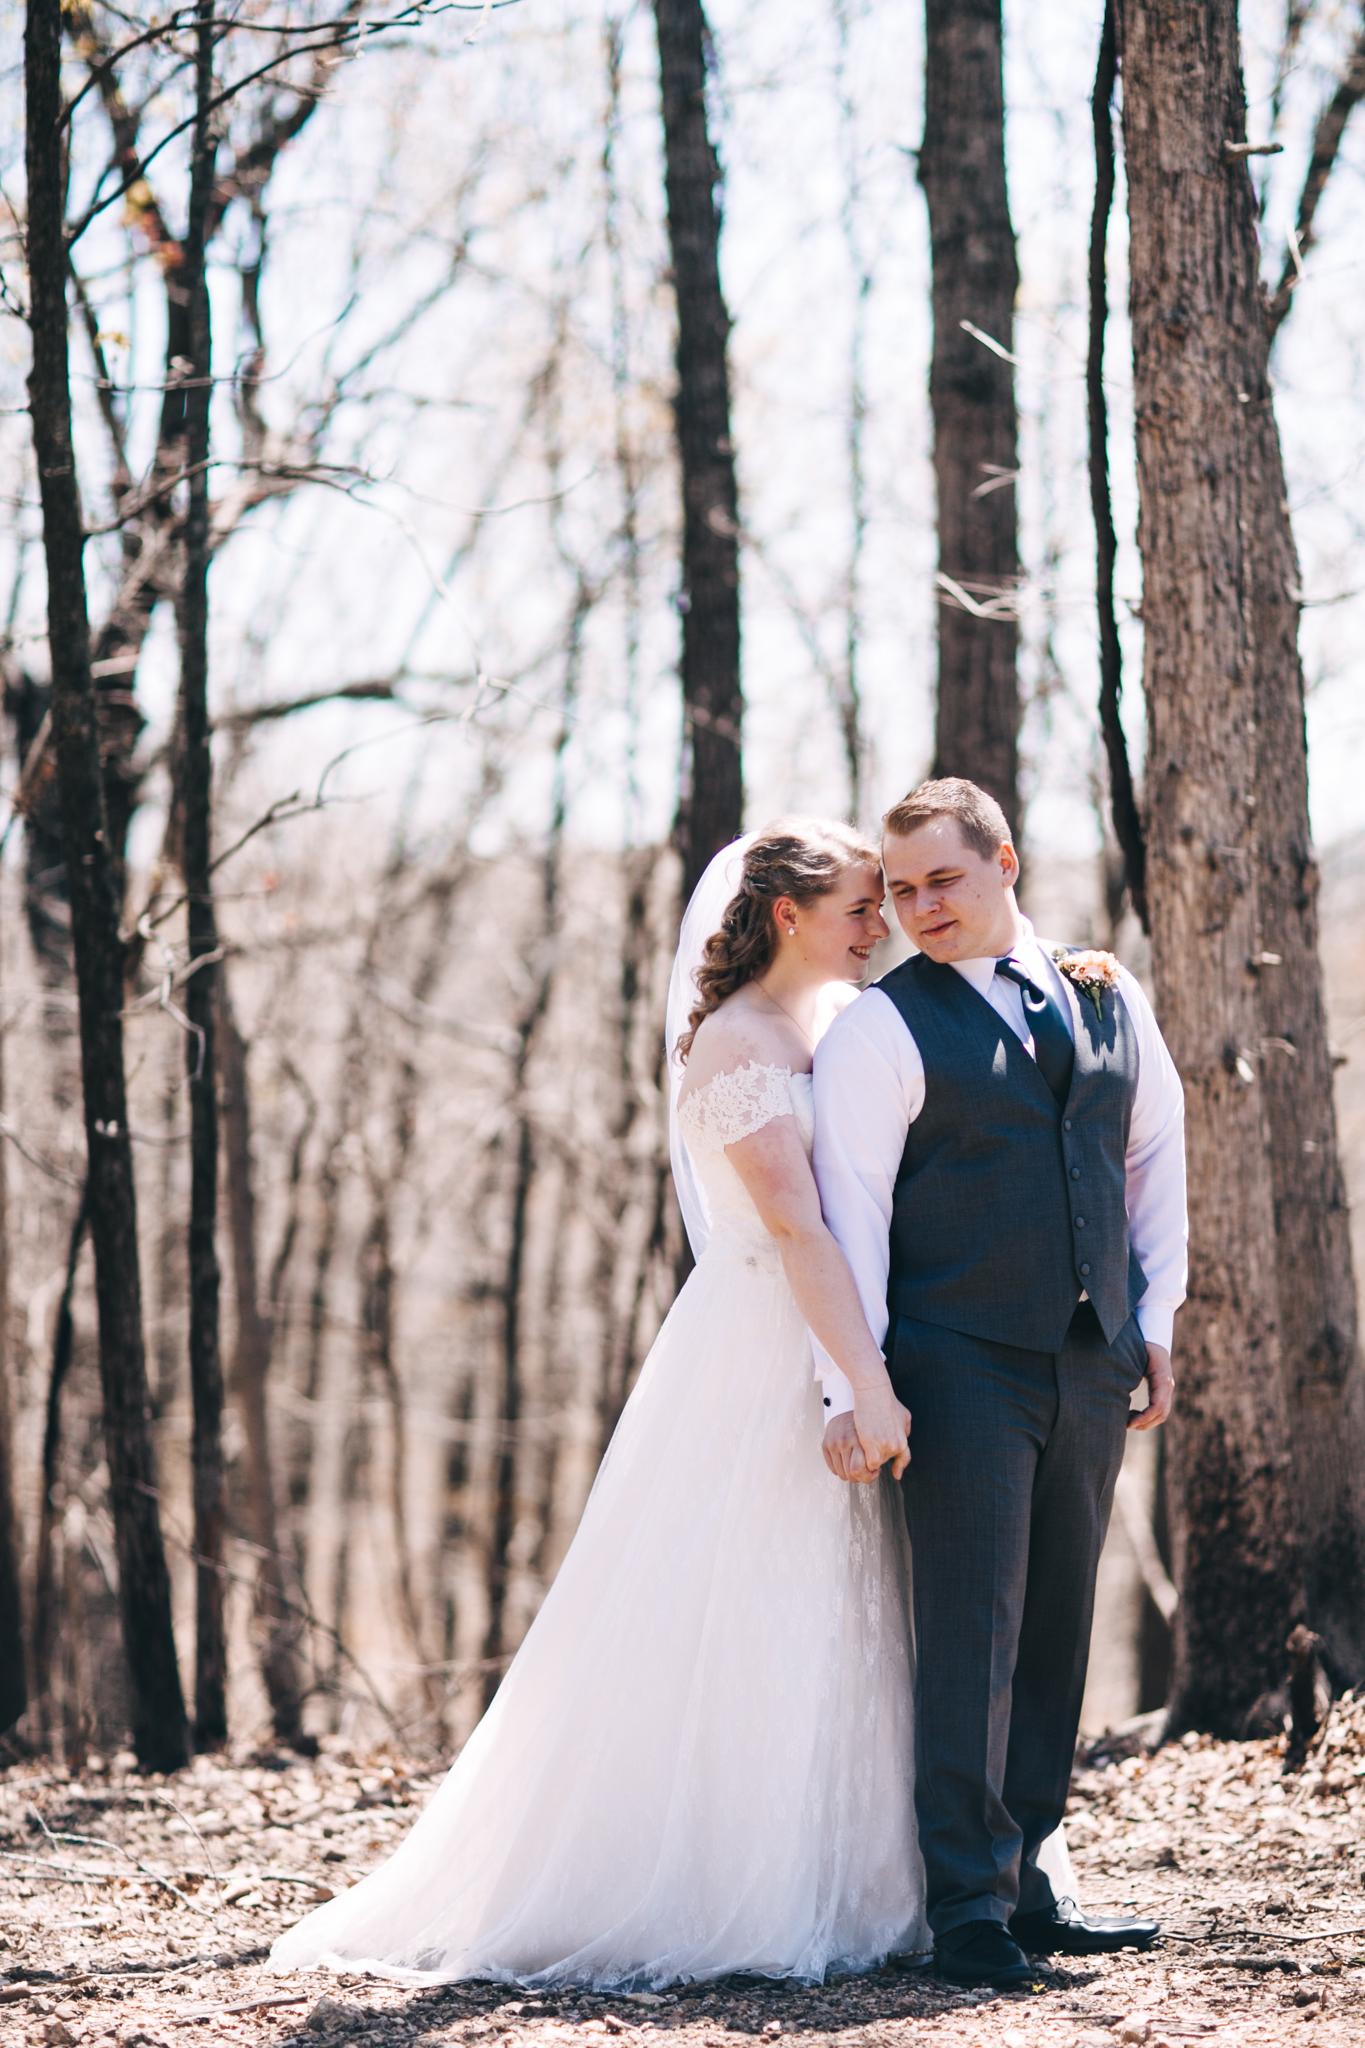 Kyle&RebeccaWedding-41